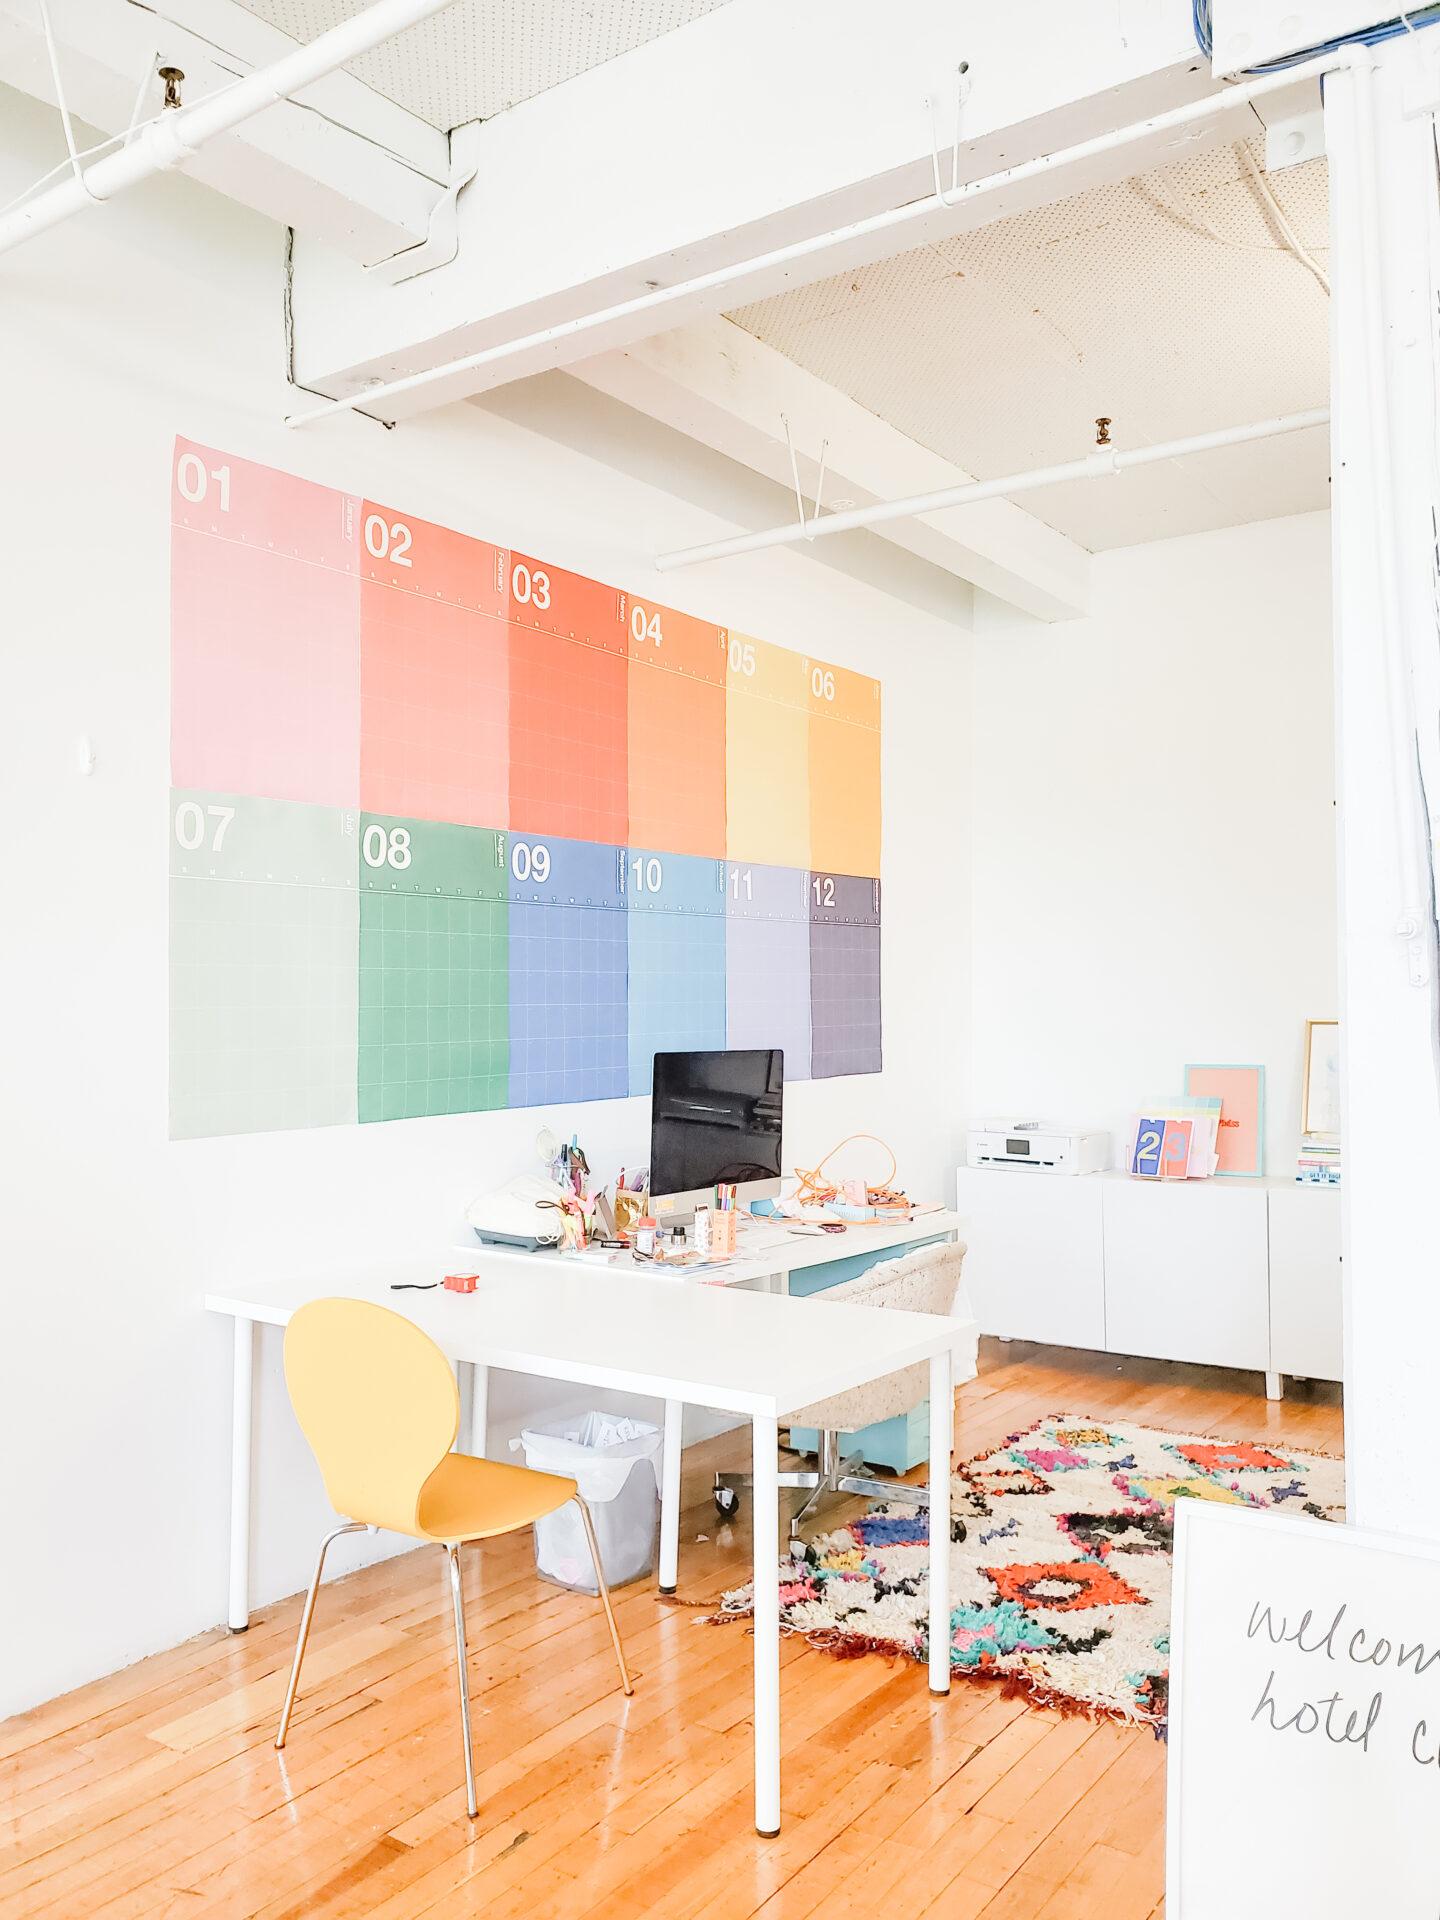 The HeyMaca Studio